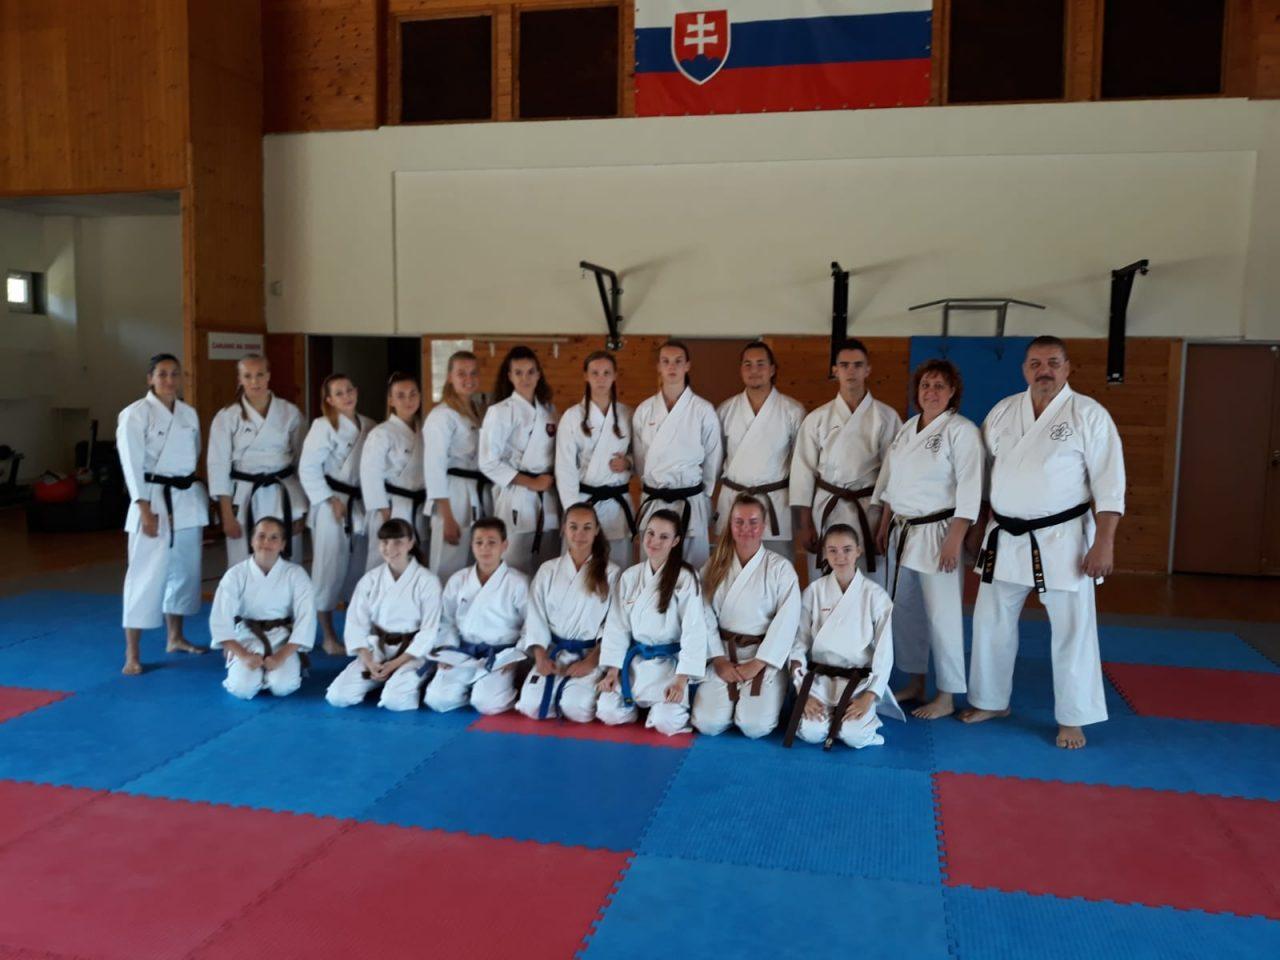 https://karate-slovakia.sk/wp-content/uploads/WhatsApp-Image-2021-07-05-at-19.40.07-1280x960.jpeg